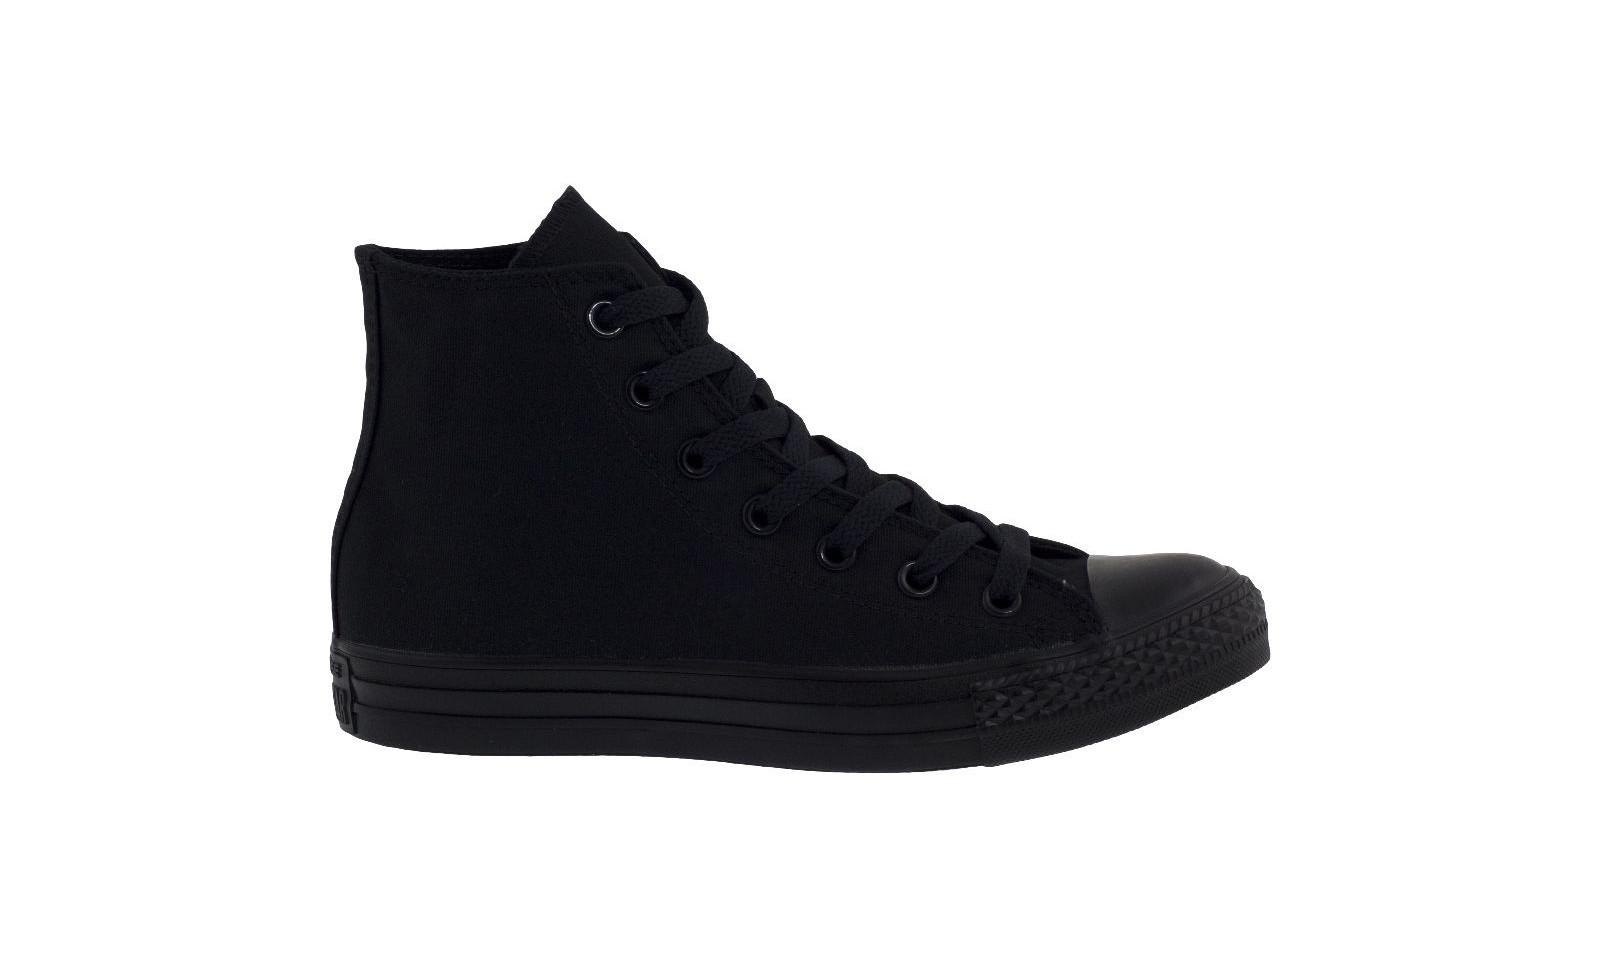 Scarpe Converse Chuck Taylor All Star Hi M3310C Black Sneakers Uomo Donna Casual